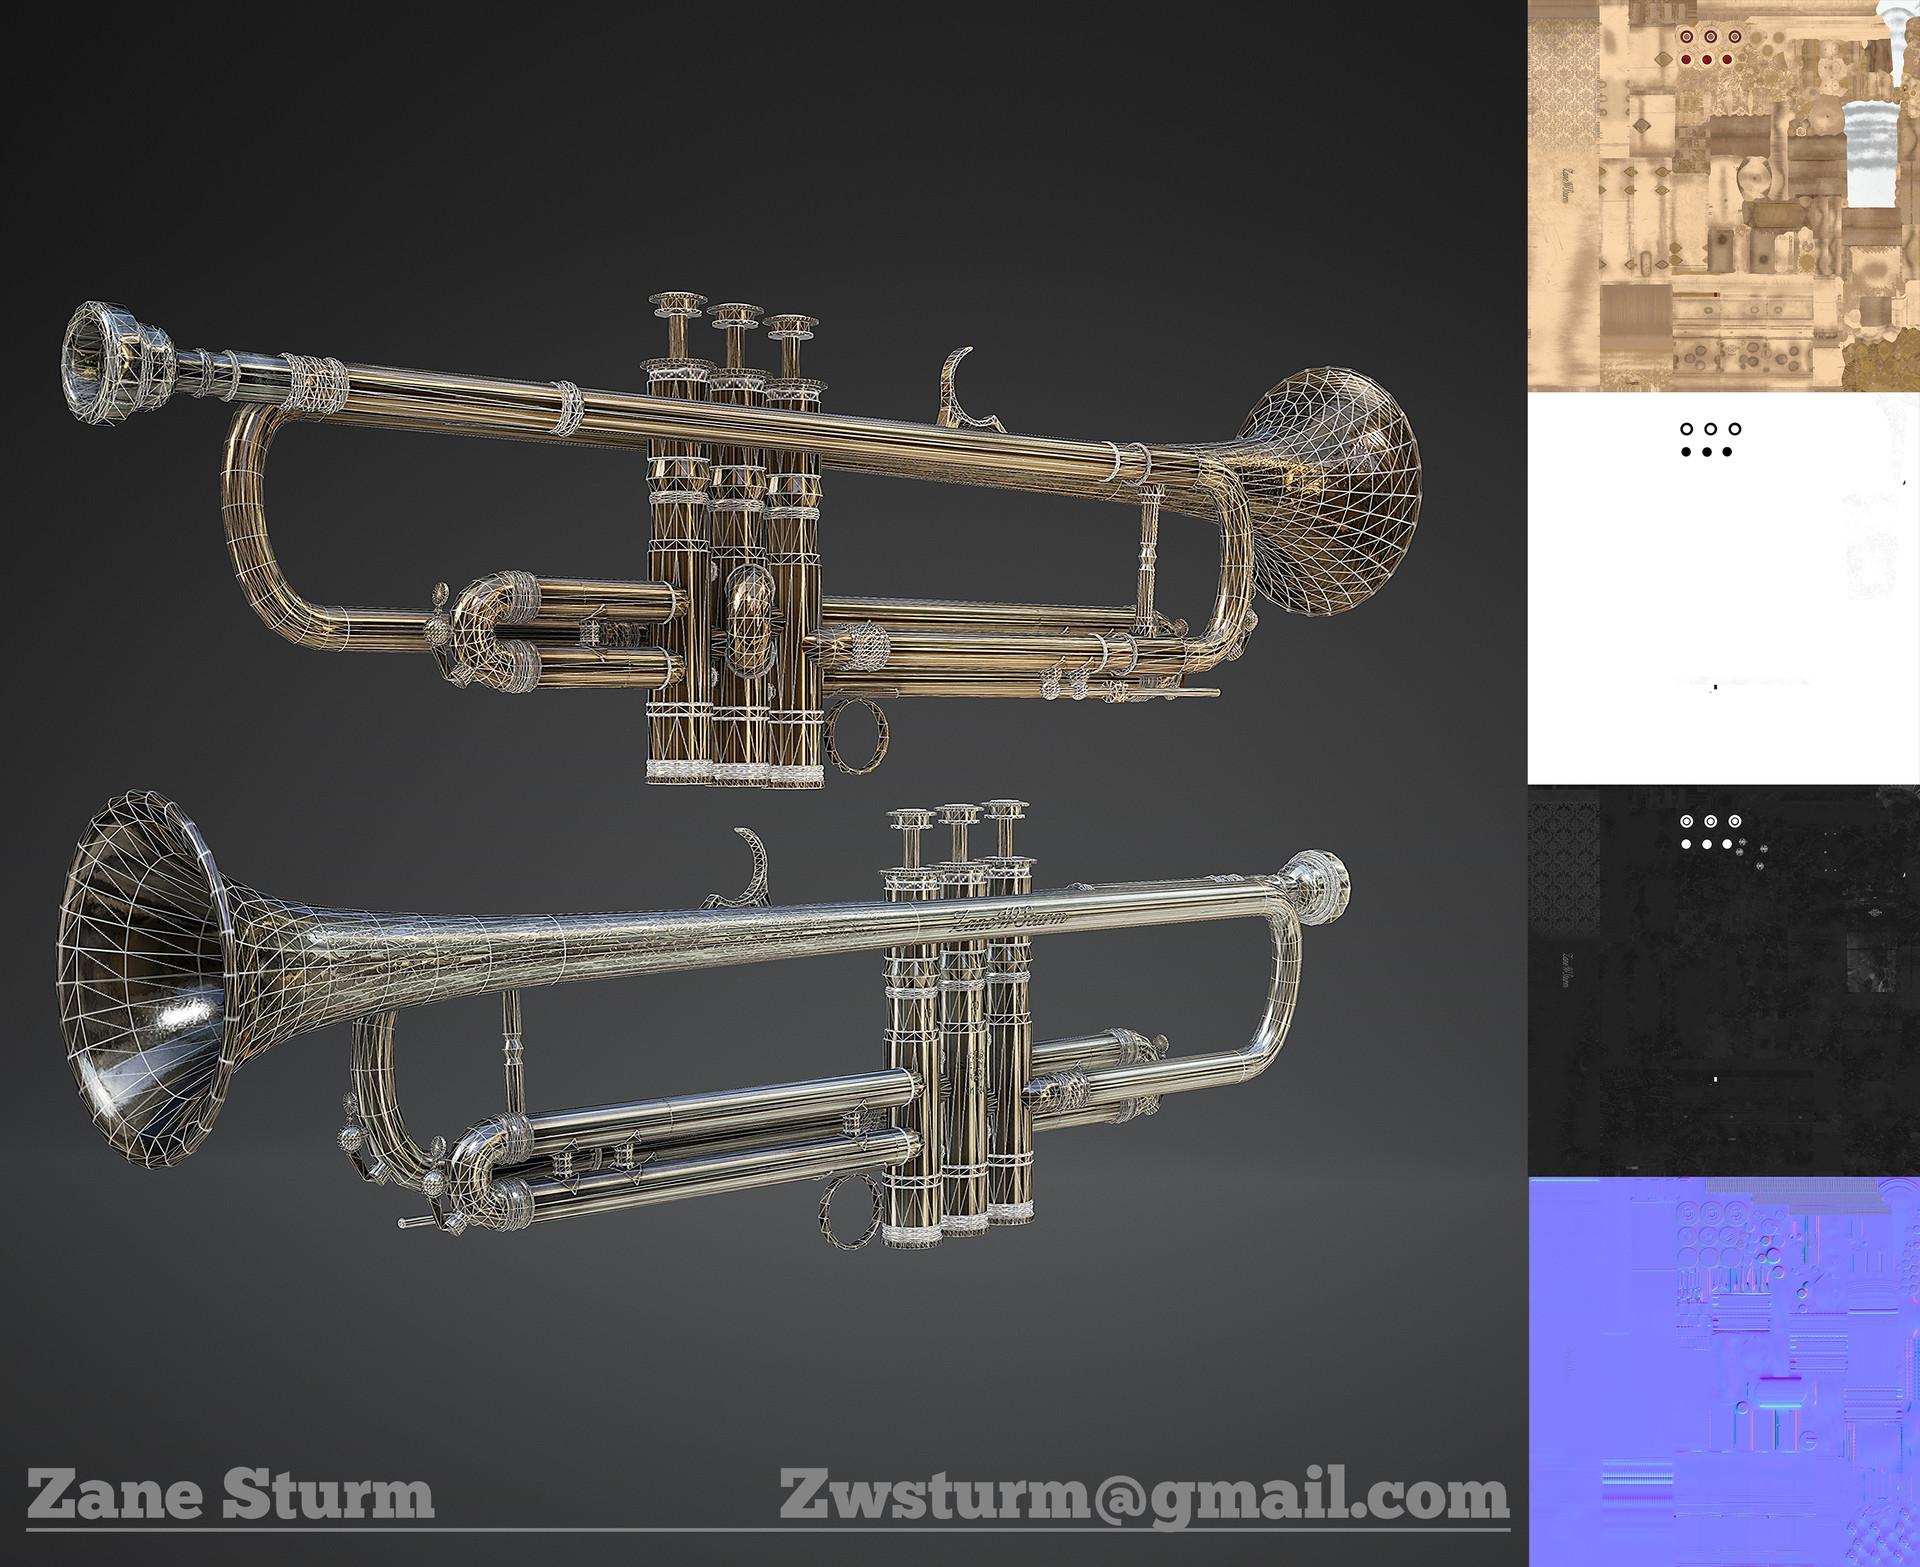 Zane sturm trumpet wireframe